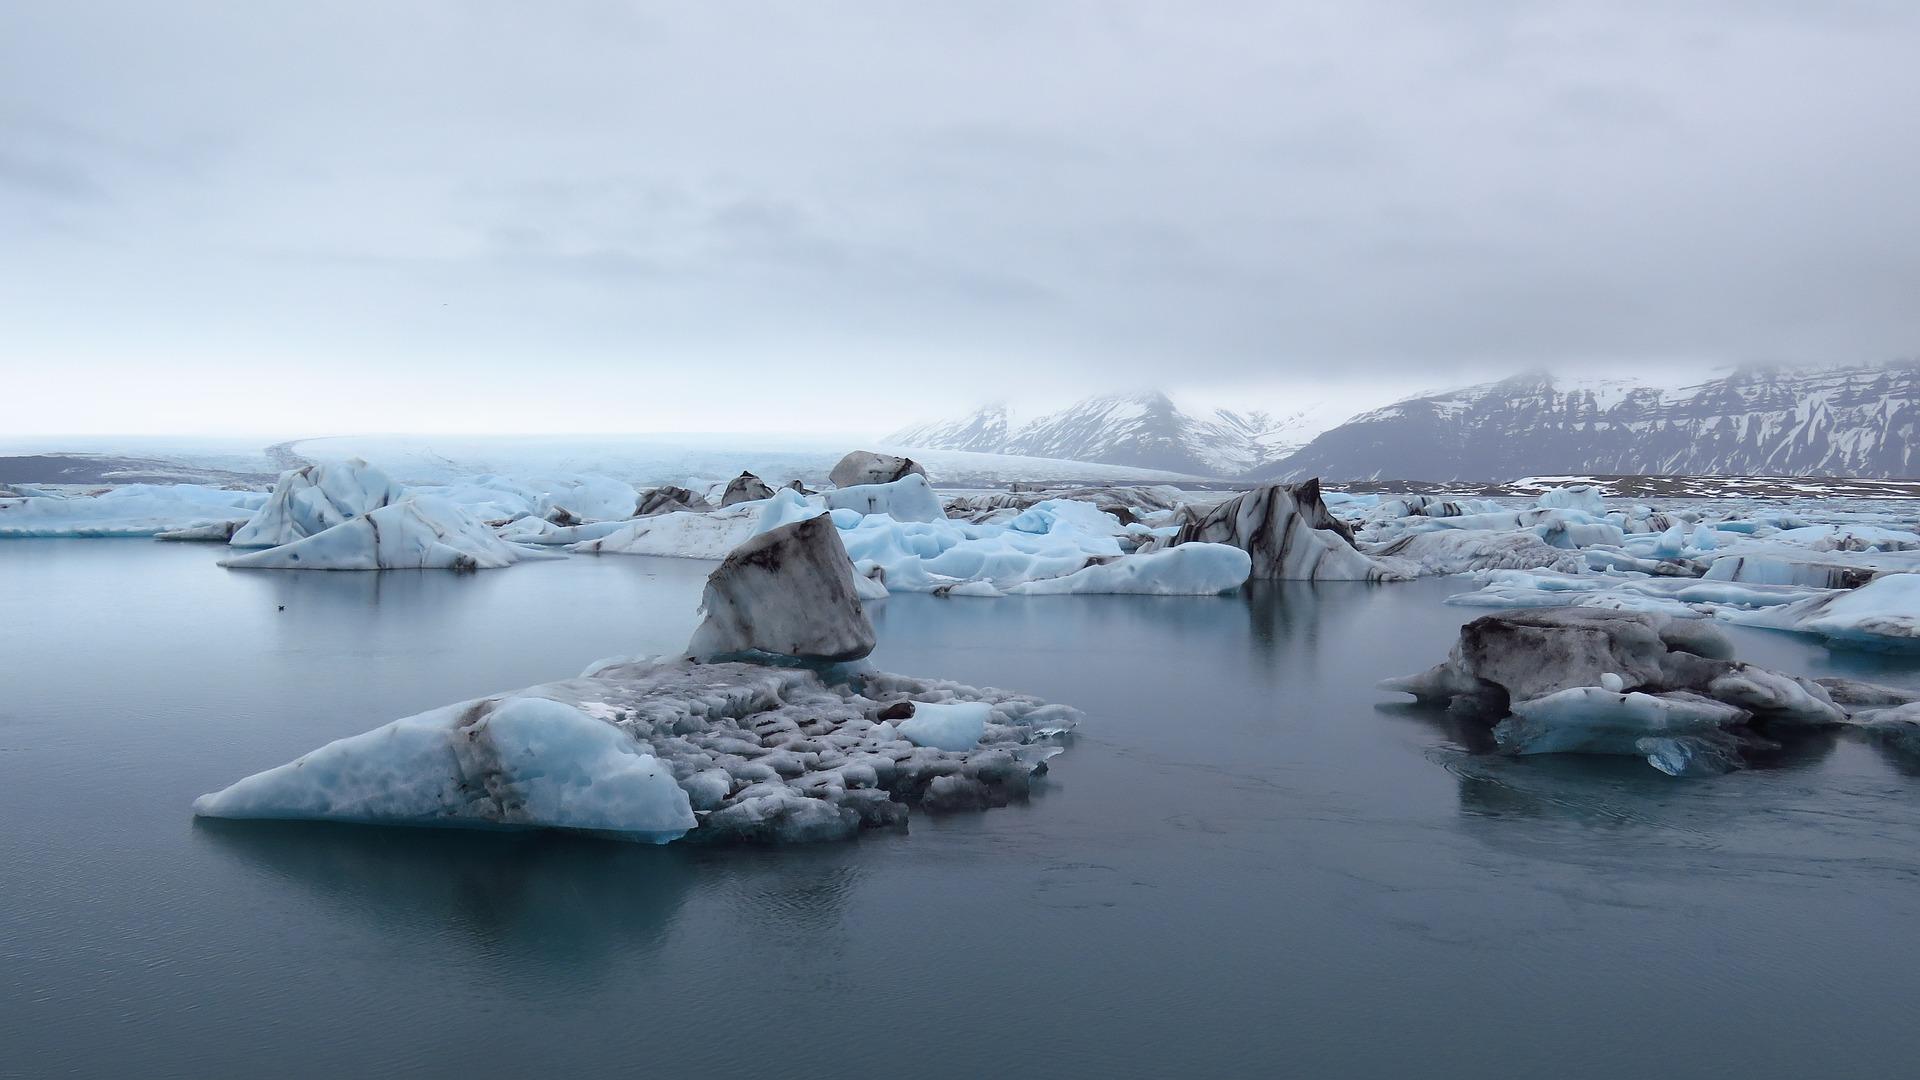 iceland-2889267_1920.jpg